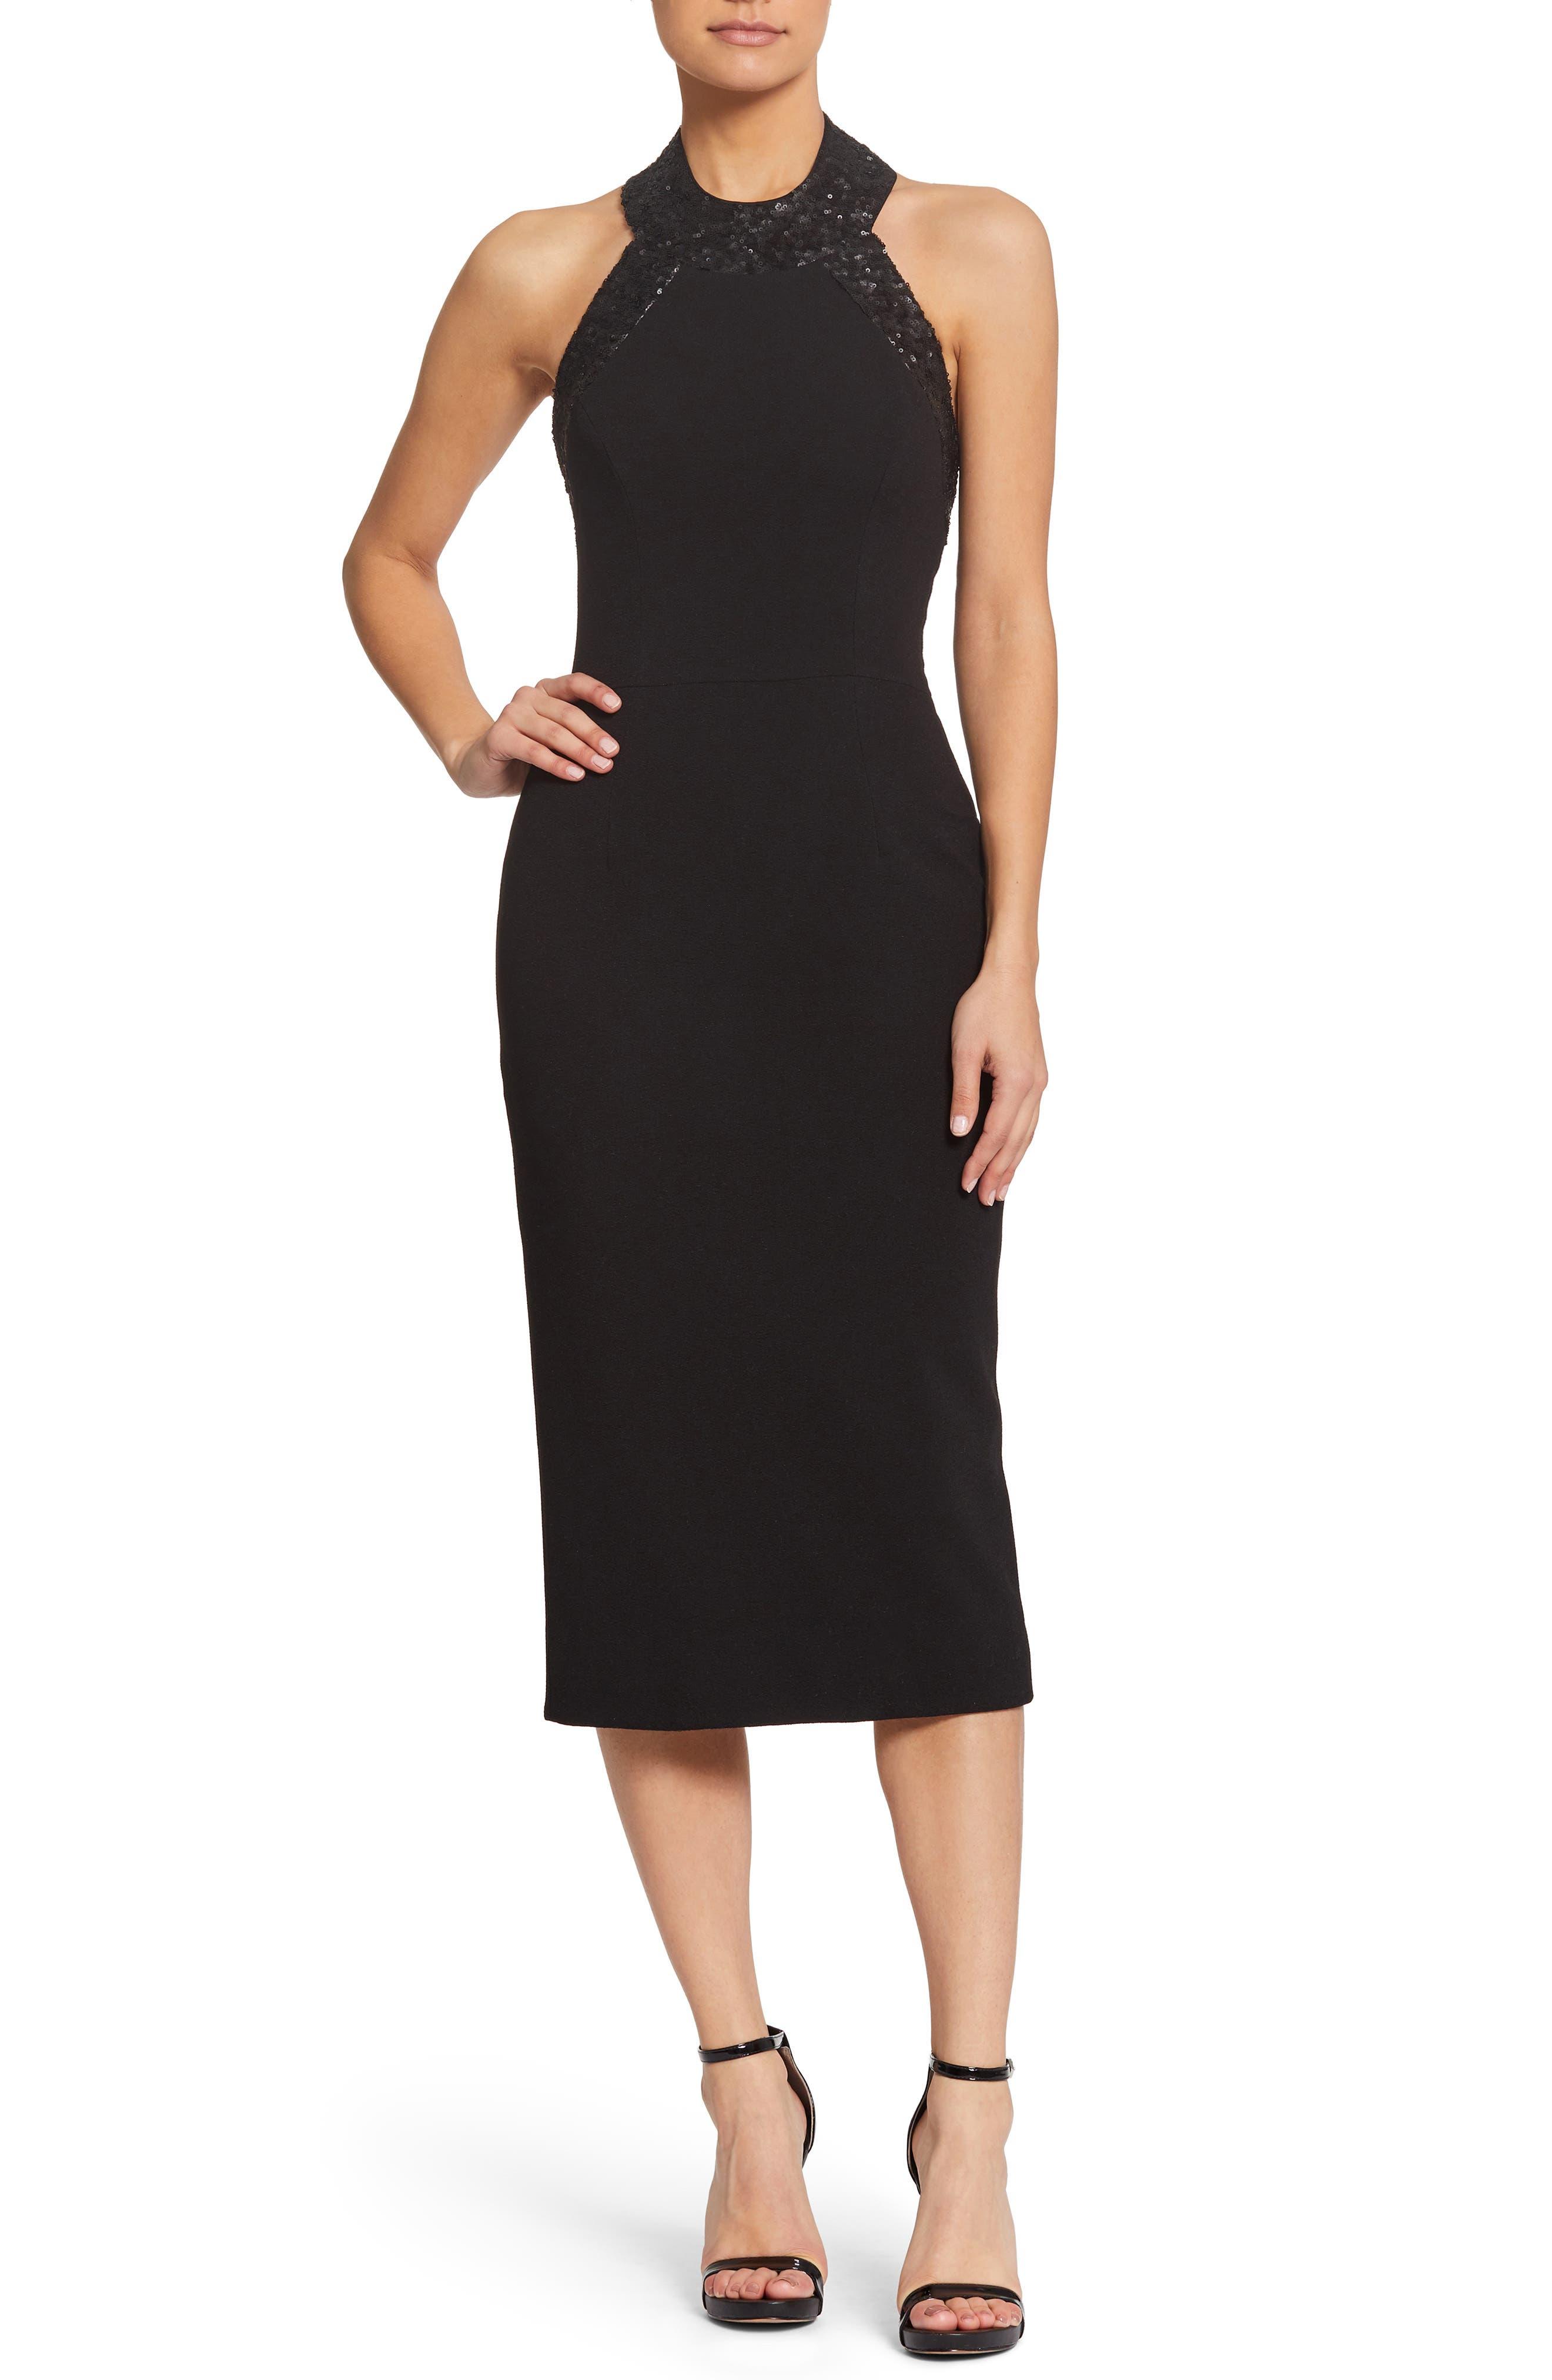 Cleo Halter Dress,                             Main thumbnail 1, color,                             BLACK/ BLACK